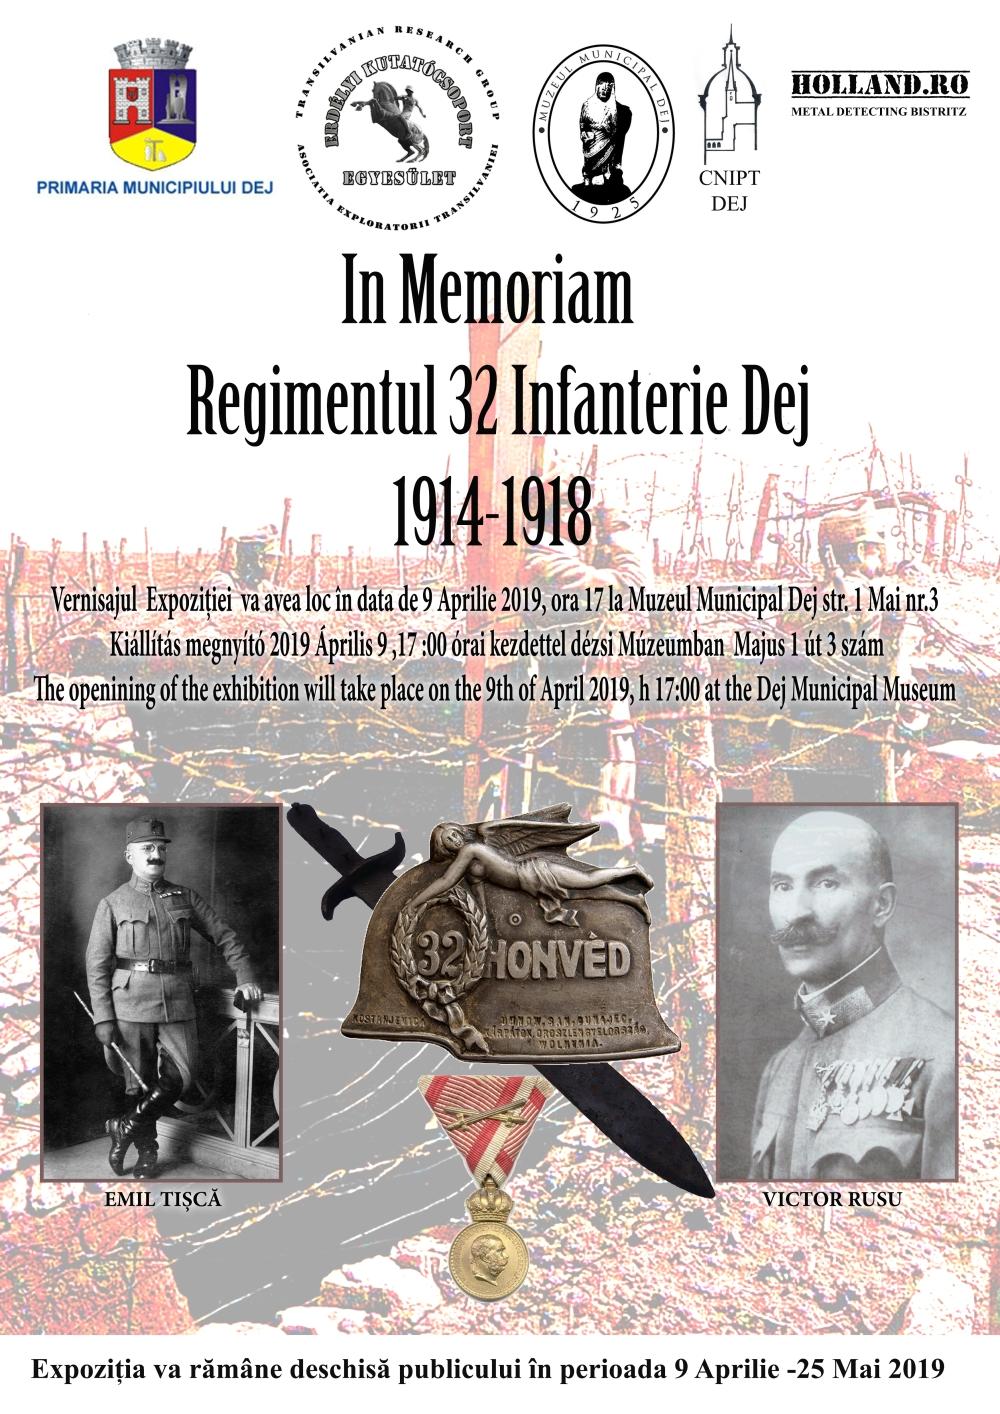 In Memoriam Regimentul 32 Infanterie Dej 1914-1918